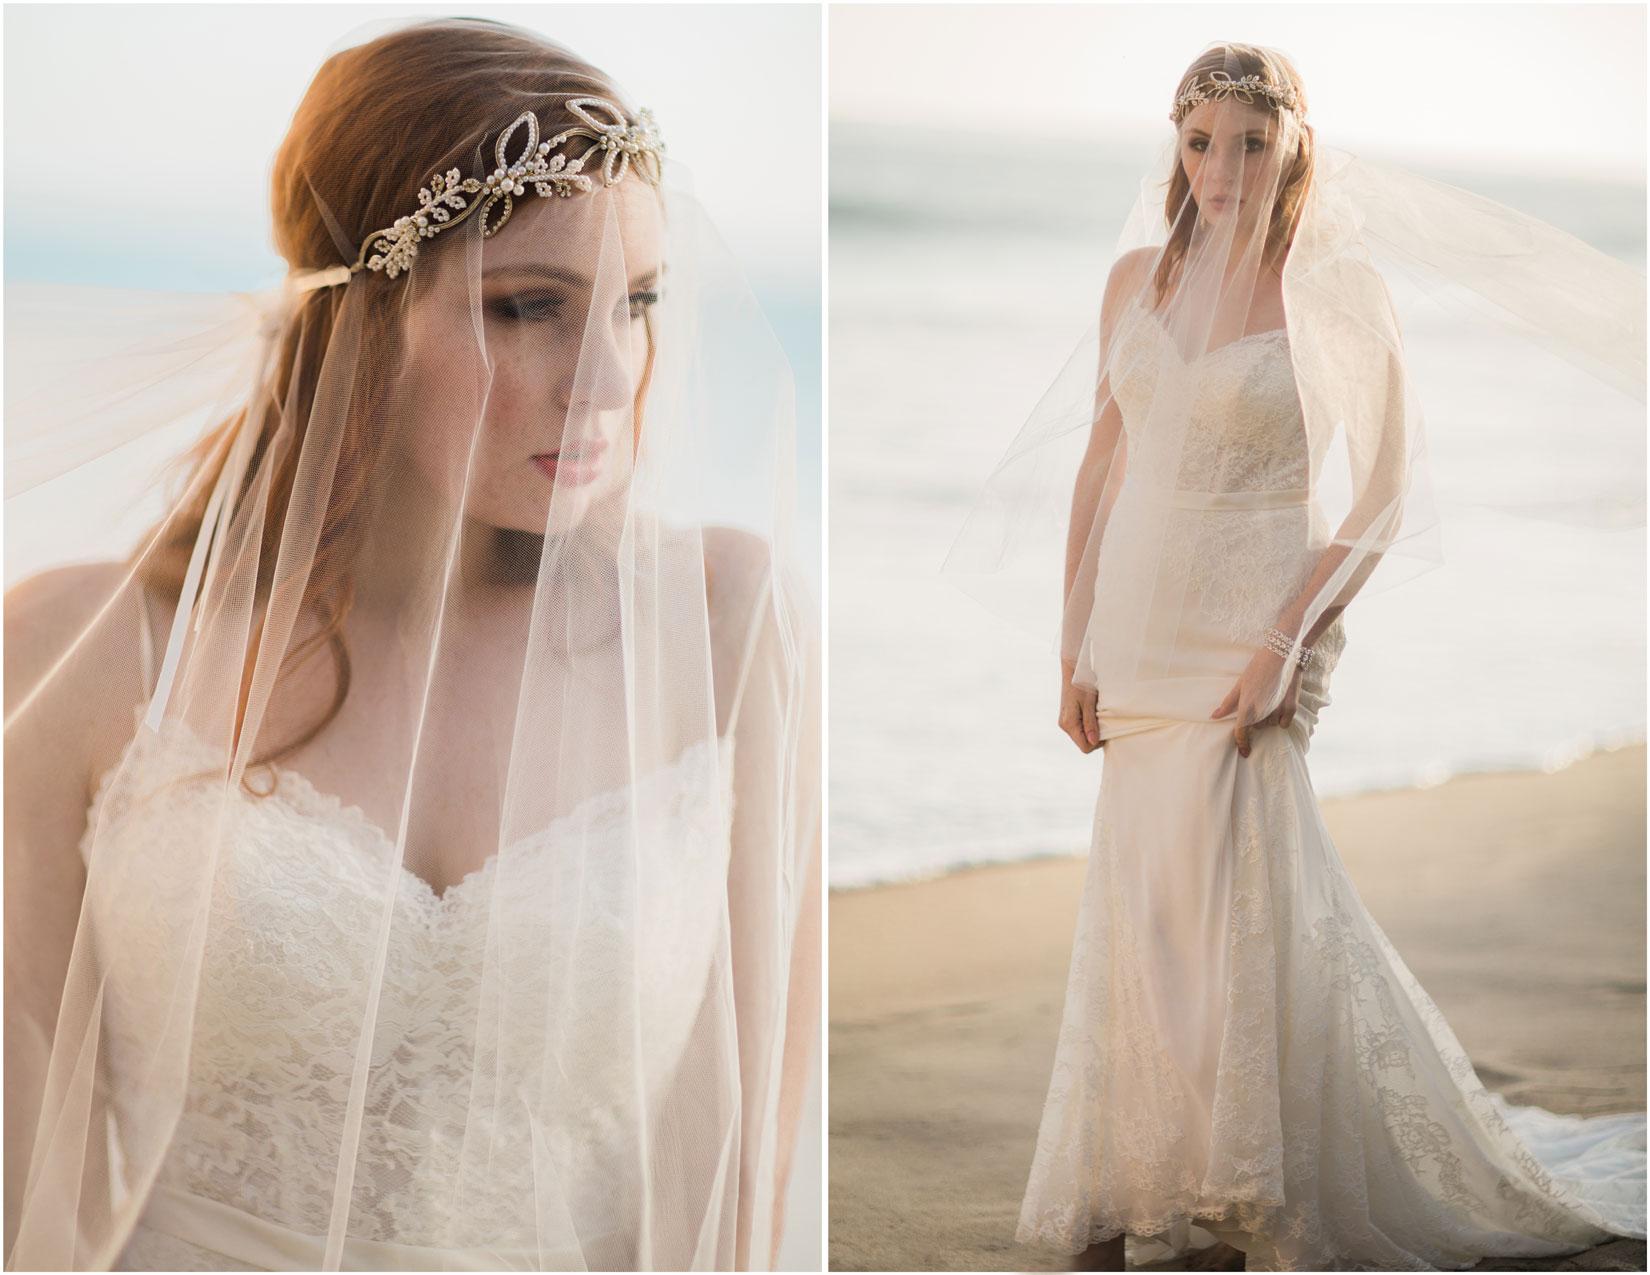 Bel-Aire-Bridal-Jen-Fuj-Photography-6558